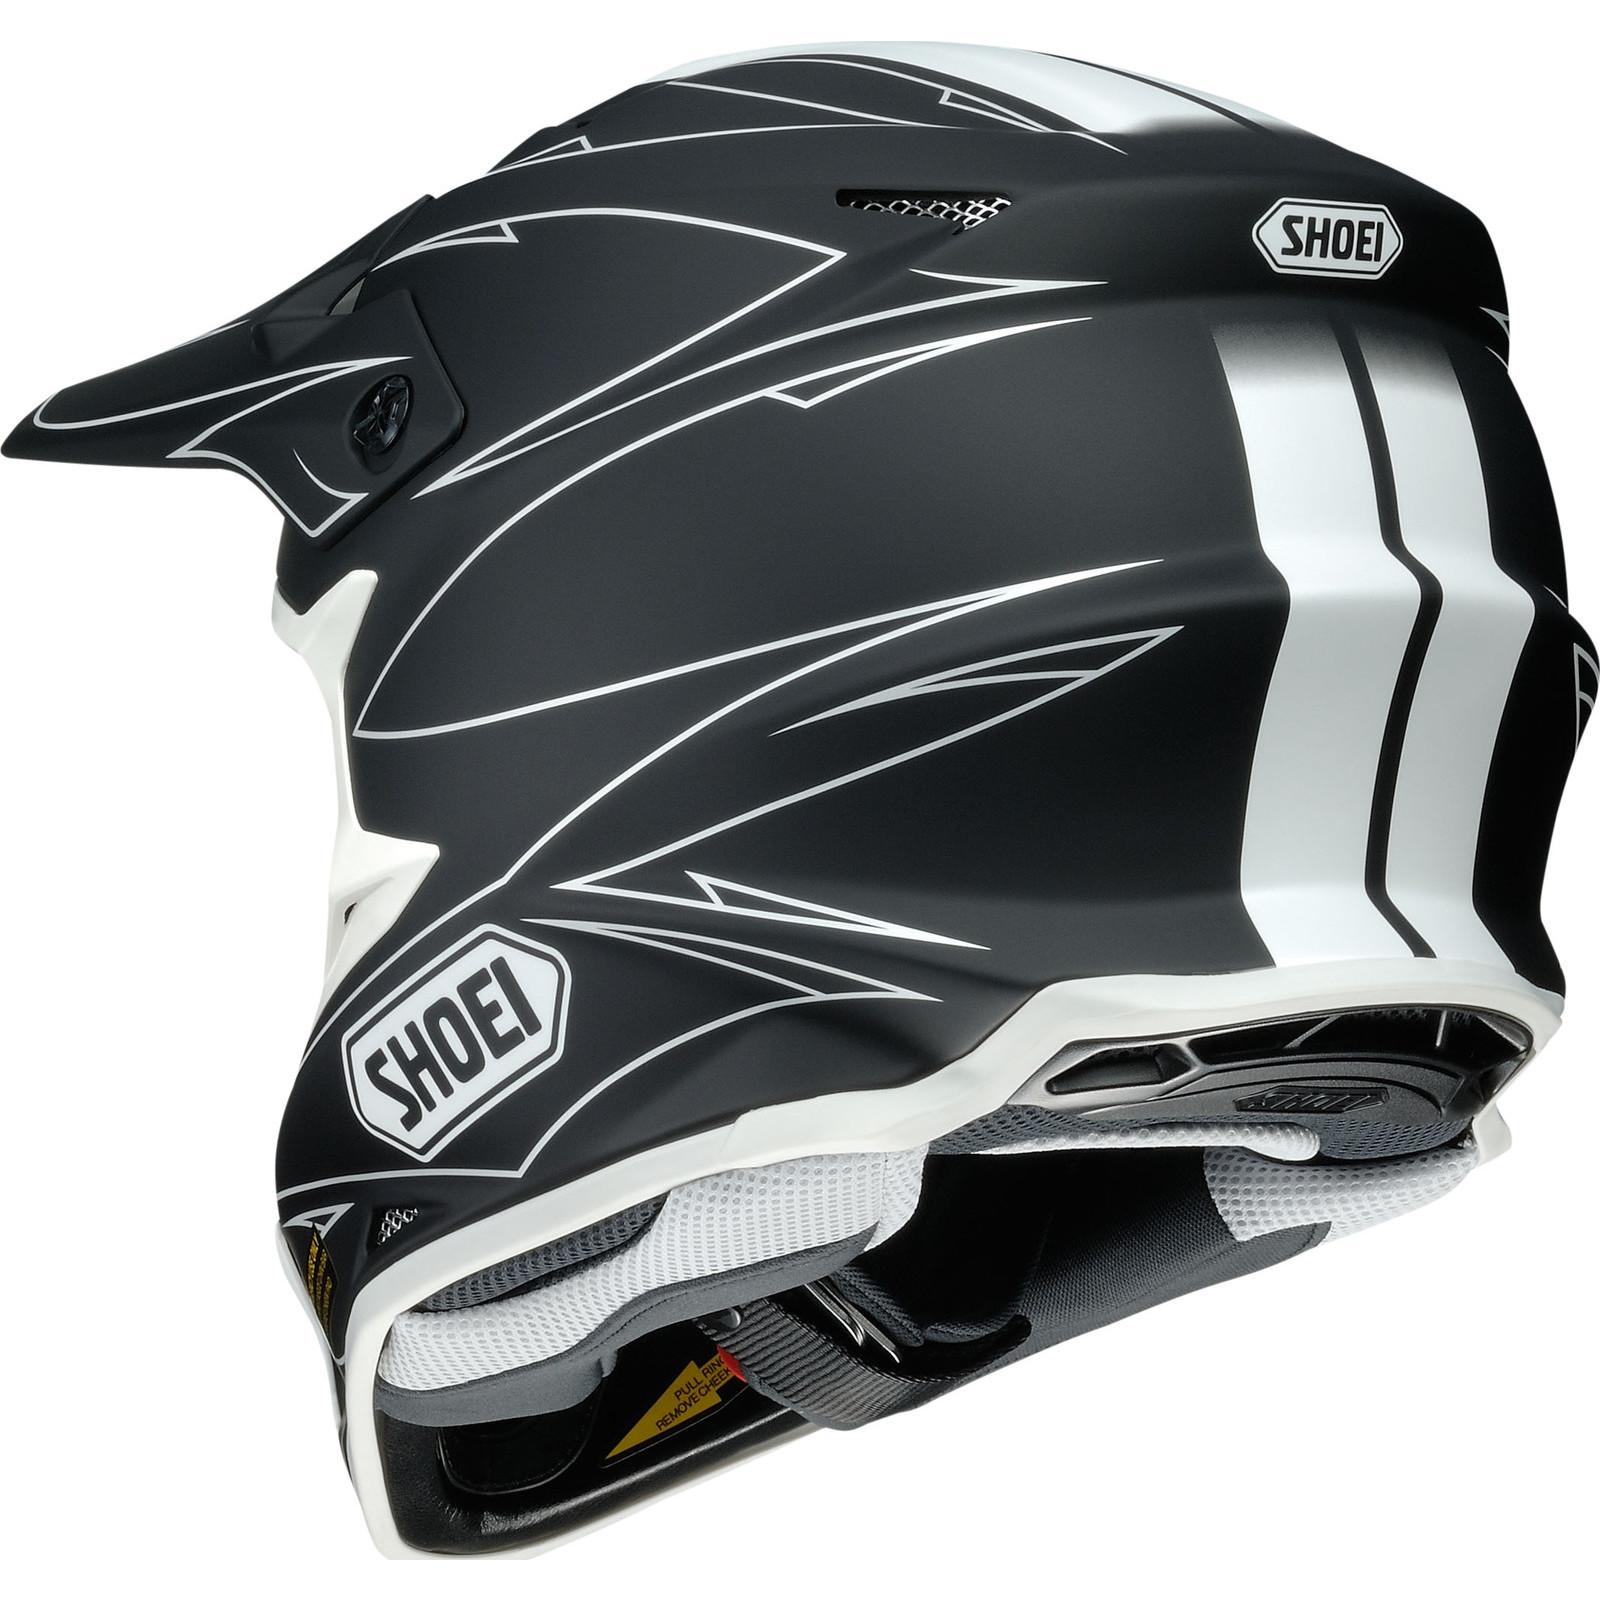 shoei vfx w hectic motocross mx helmet dirt adventure enduro off road snell acu ebay. Black Bedroom Furniture Sets. Home Design Ideas